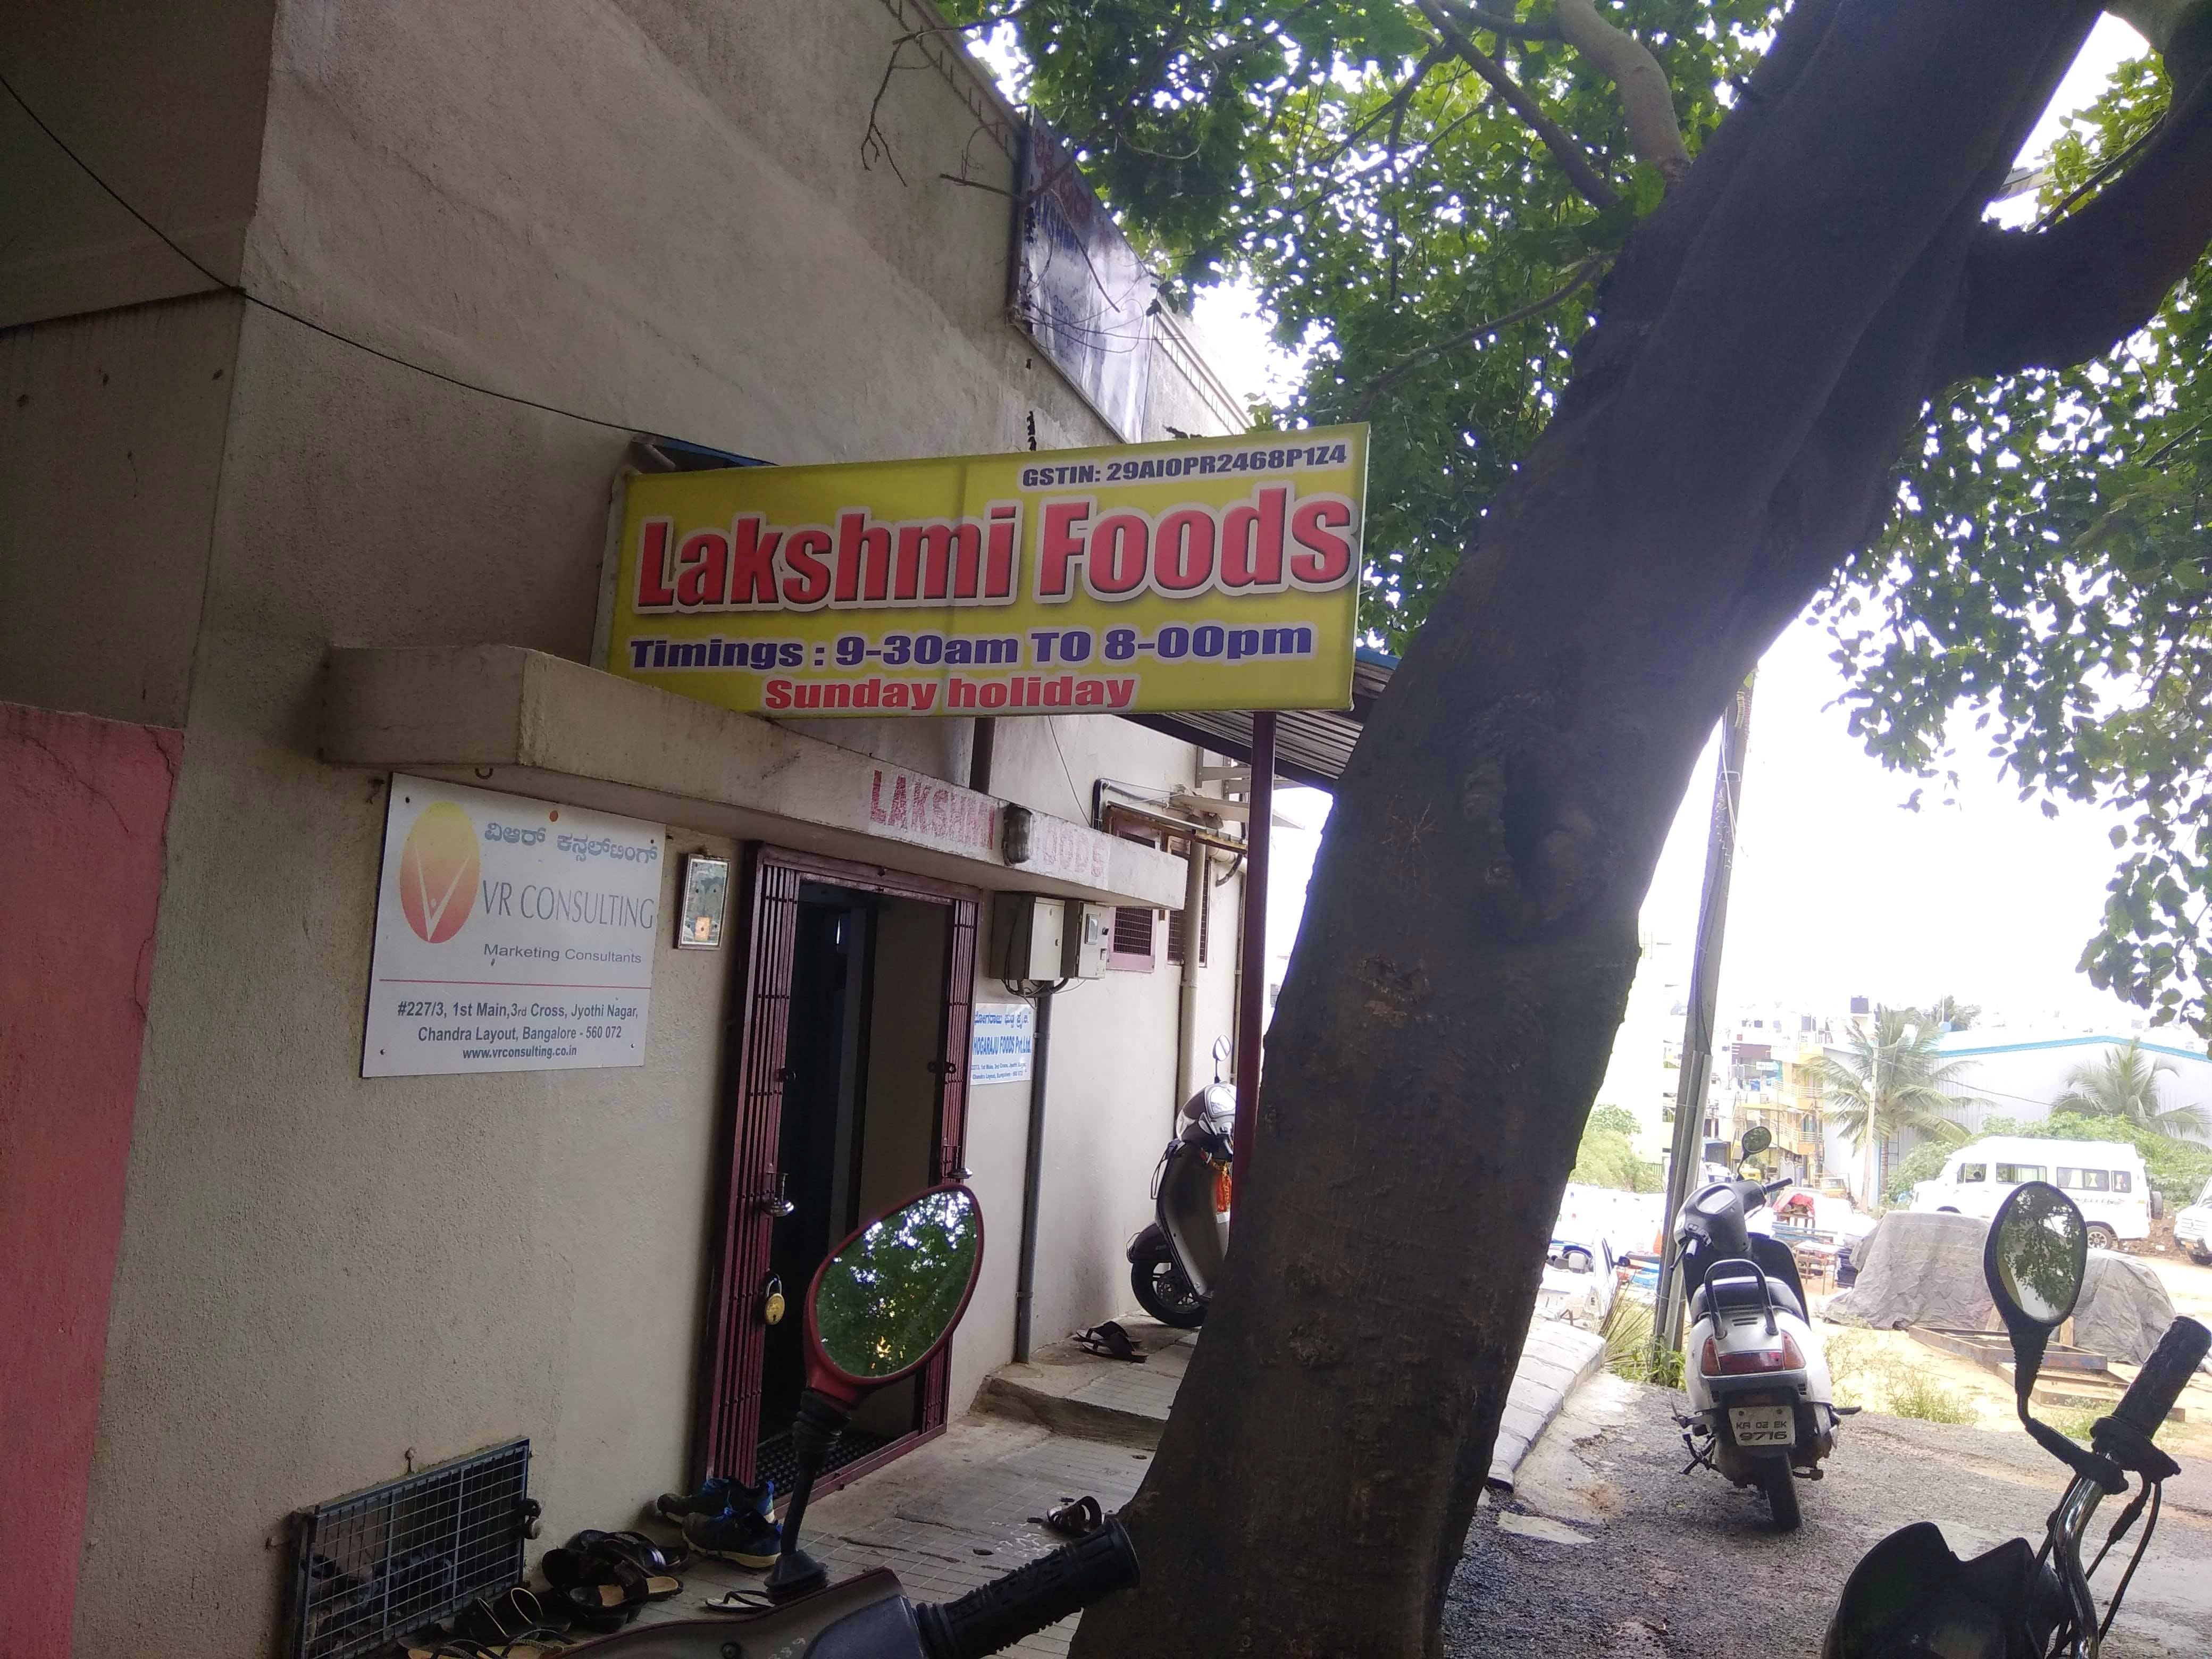 image - Lakshmi Foods